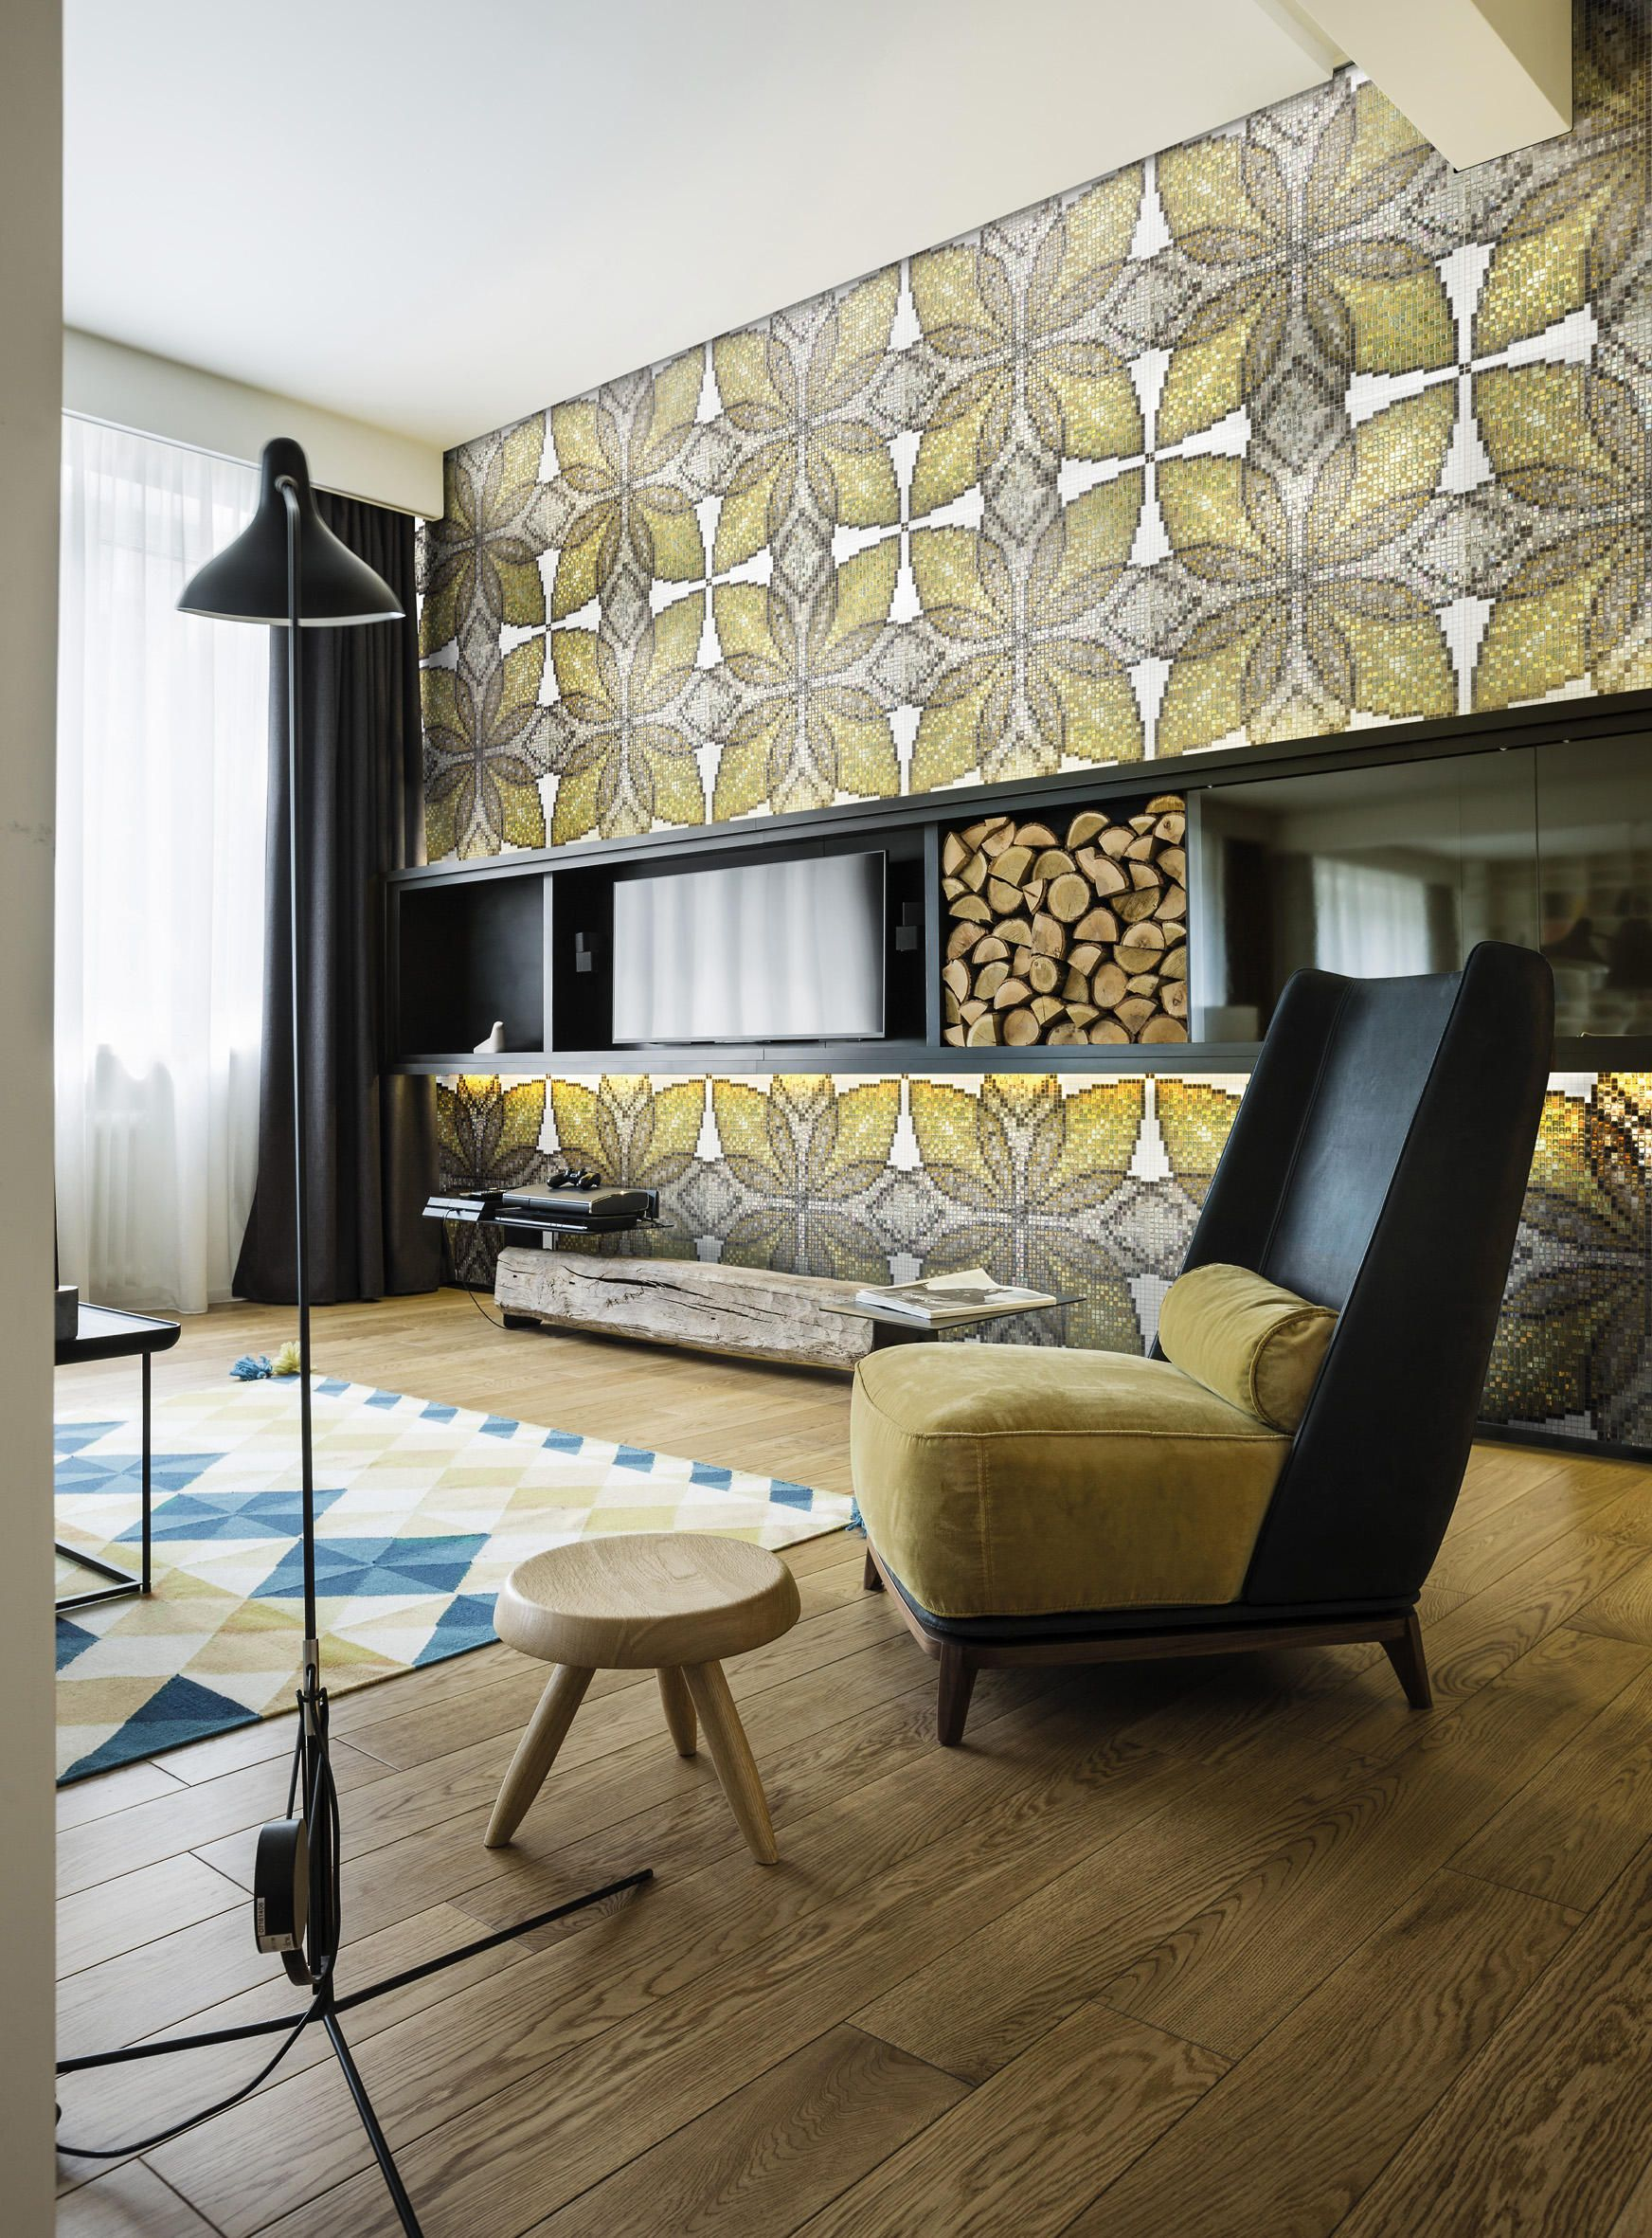 10x10 Room Design: Botanic Tale 10x10 Puranto By Mosaico+